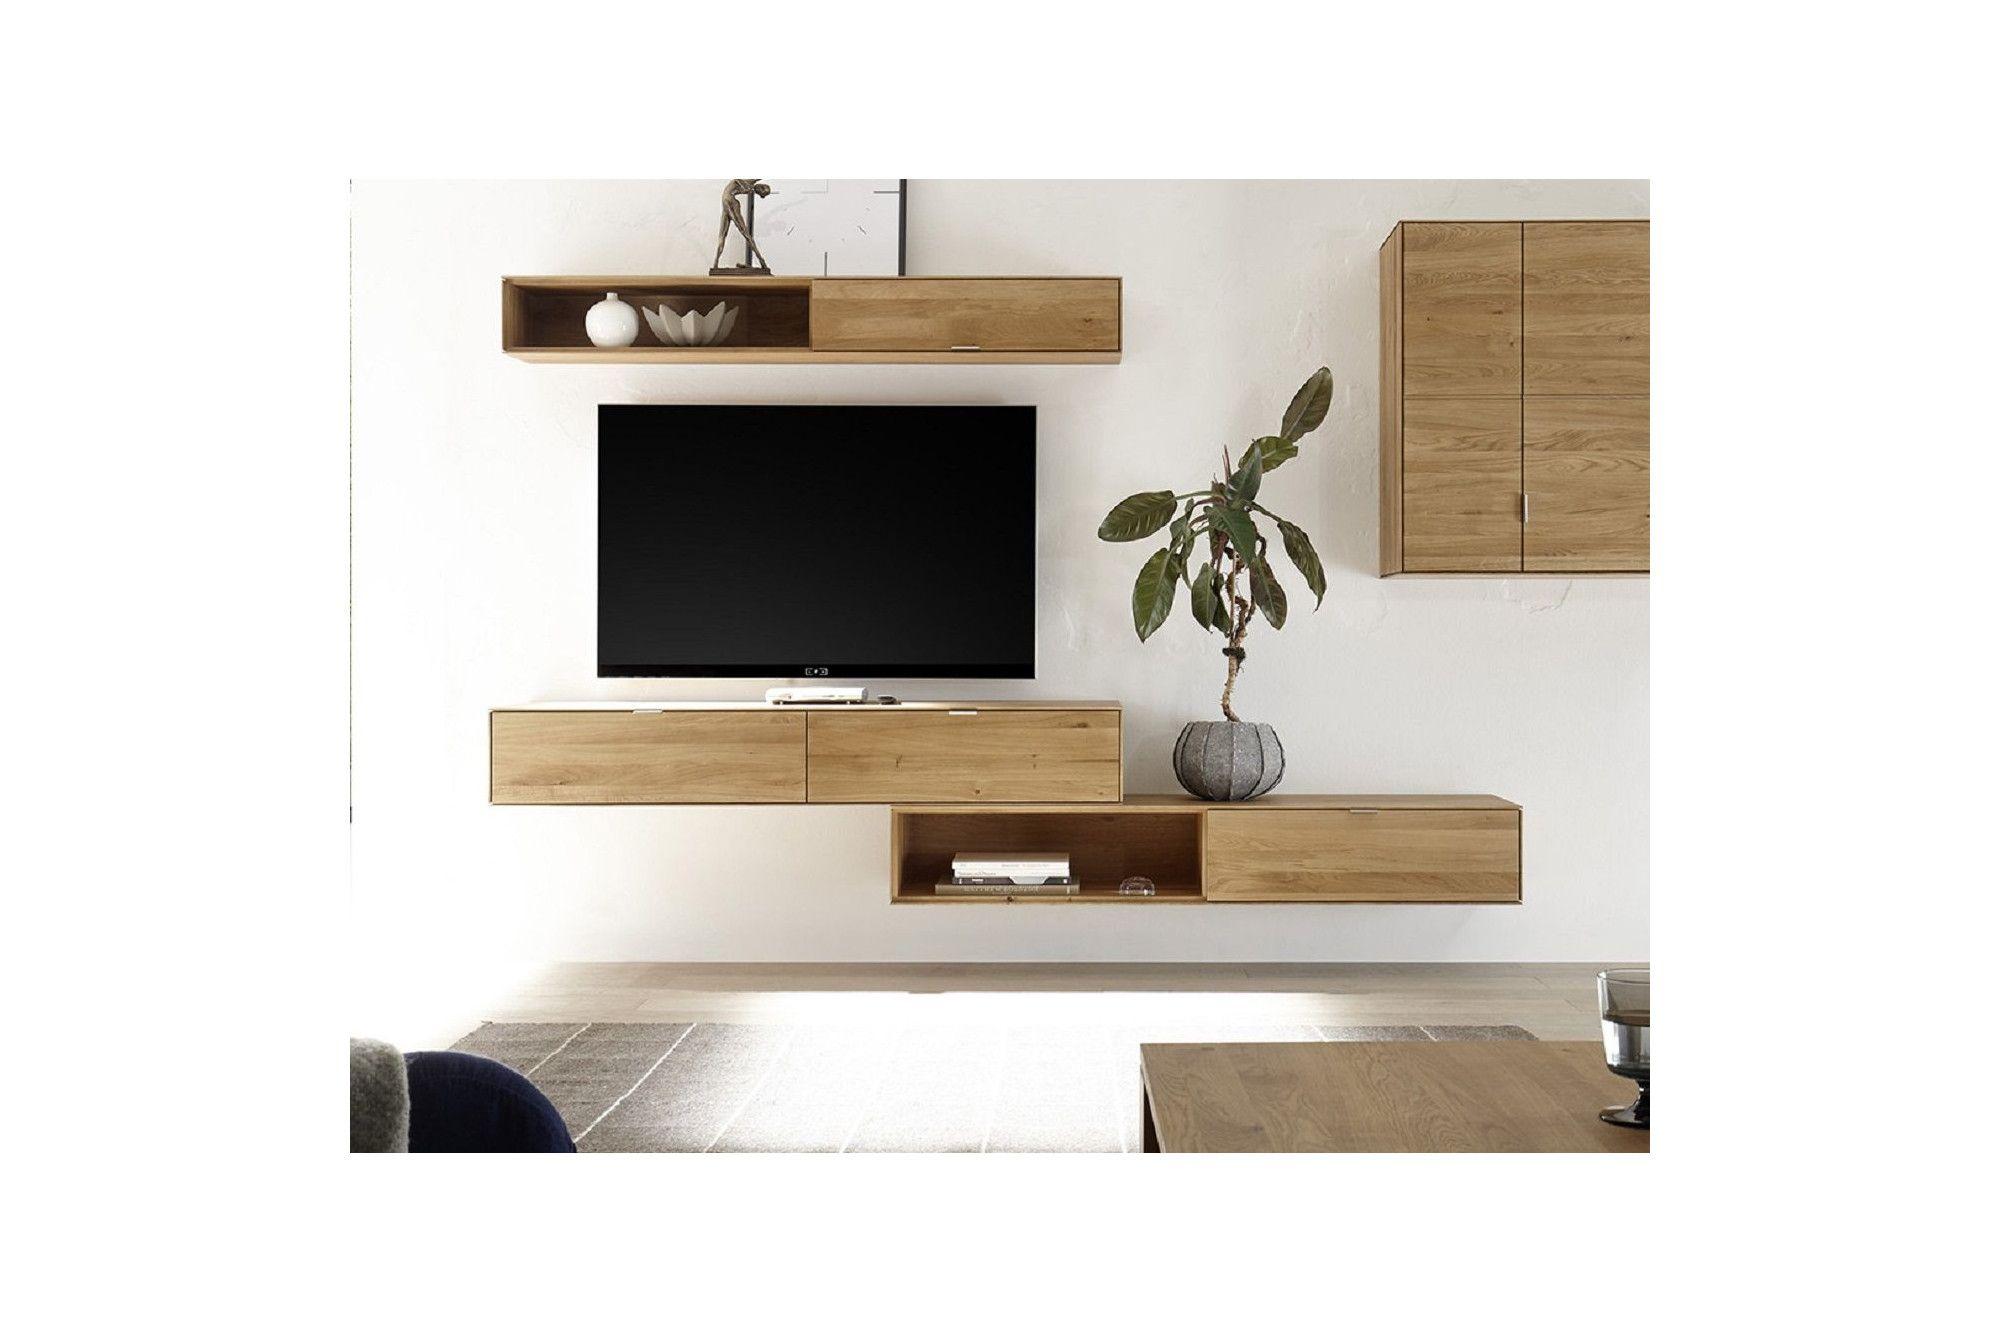 Meuble Tv Pour Coin meuble tv suspendu en chêne massif / 2 tiroirs - hellin en